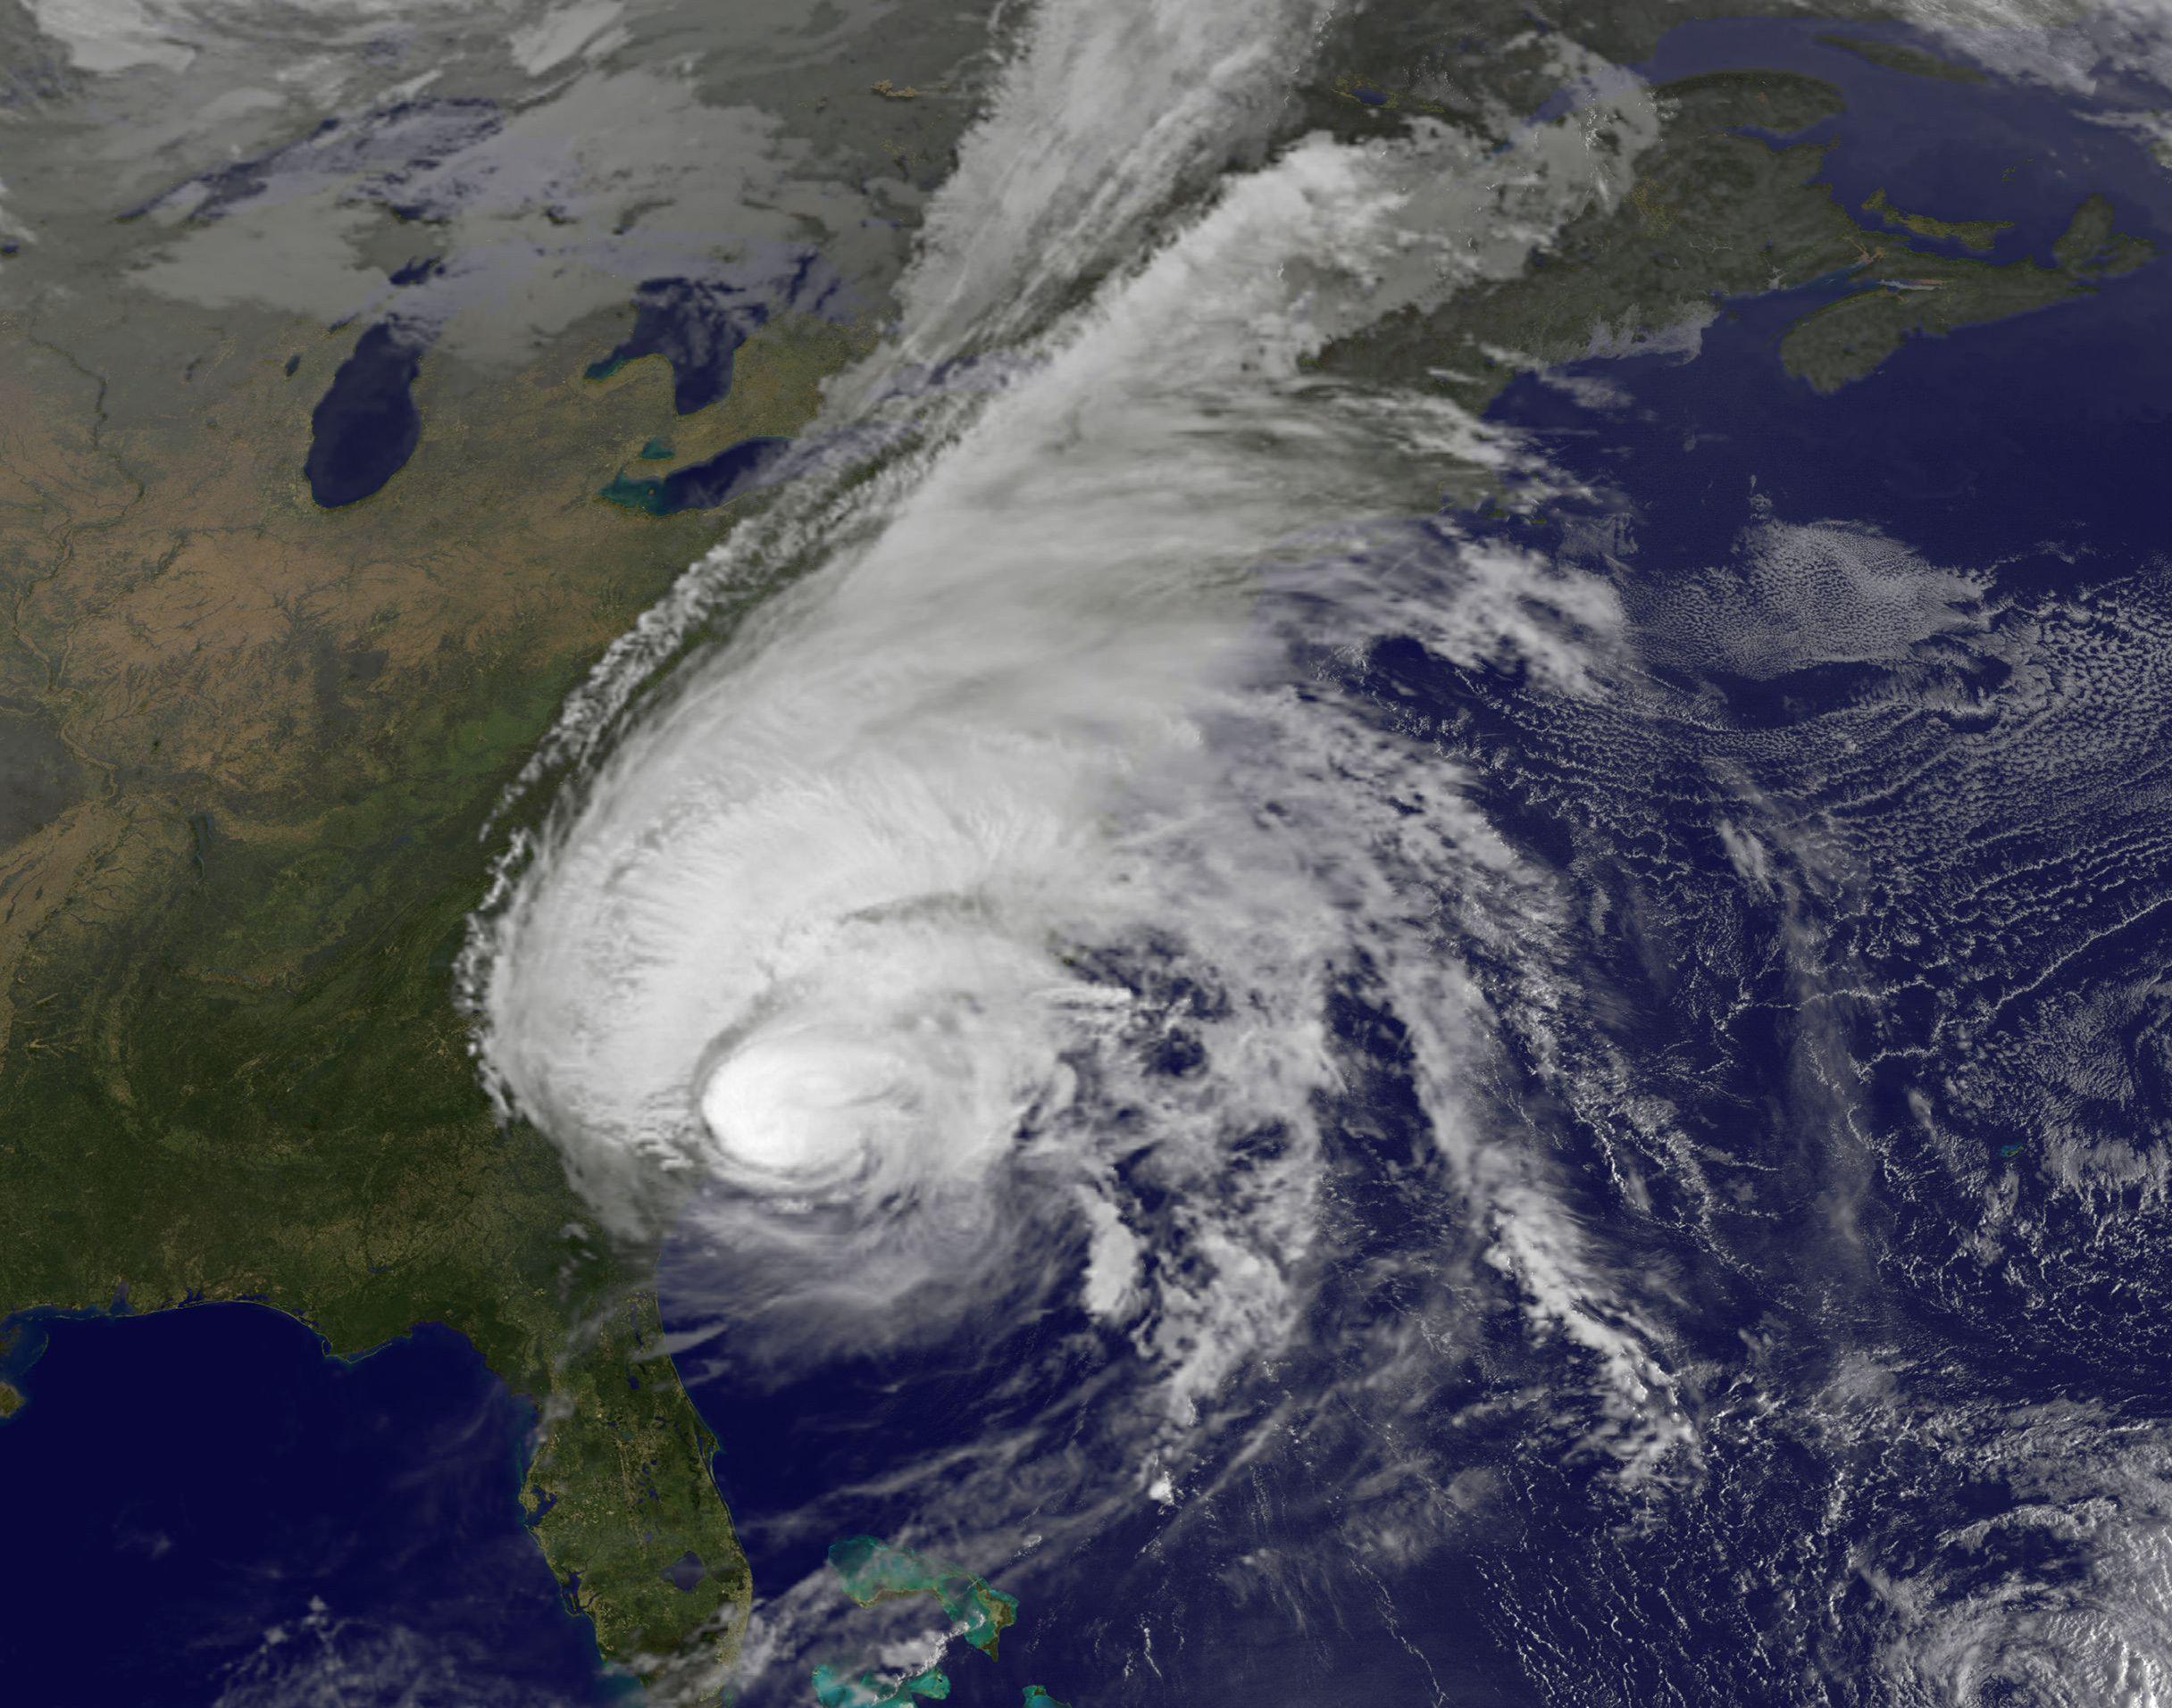 Two Decades Of Hurricanes Change Coastal Ecosystems